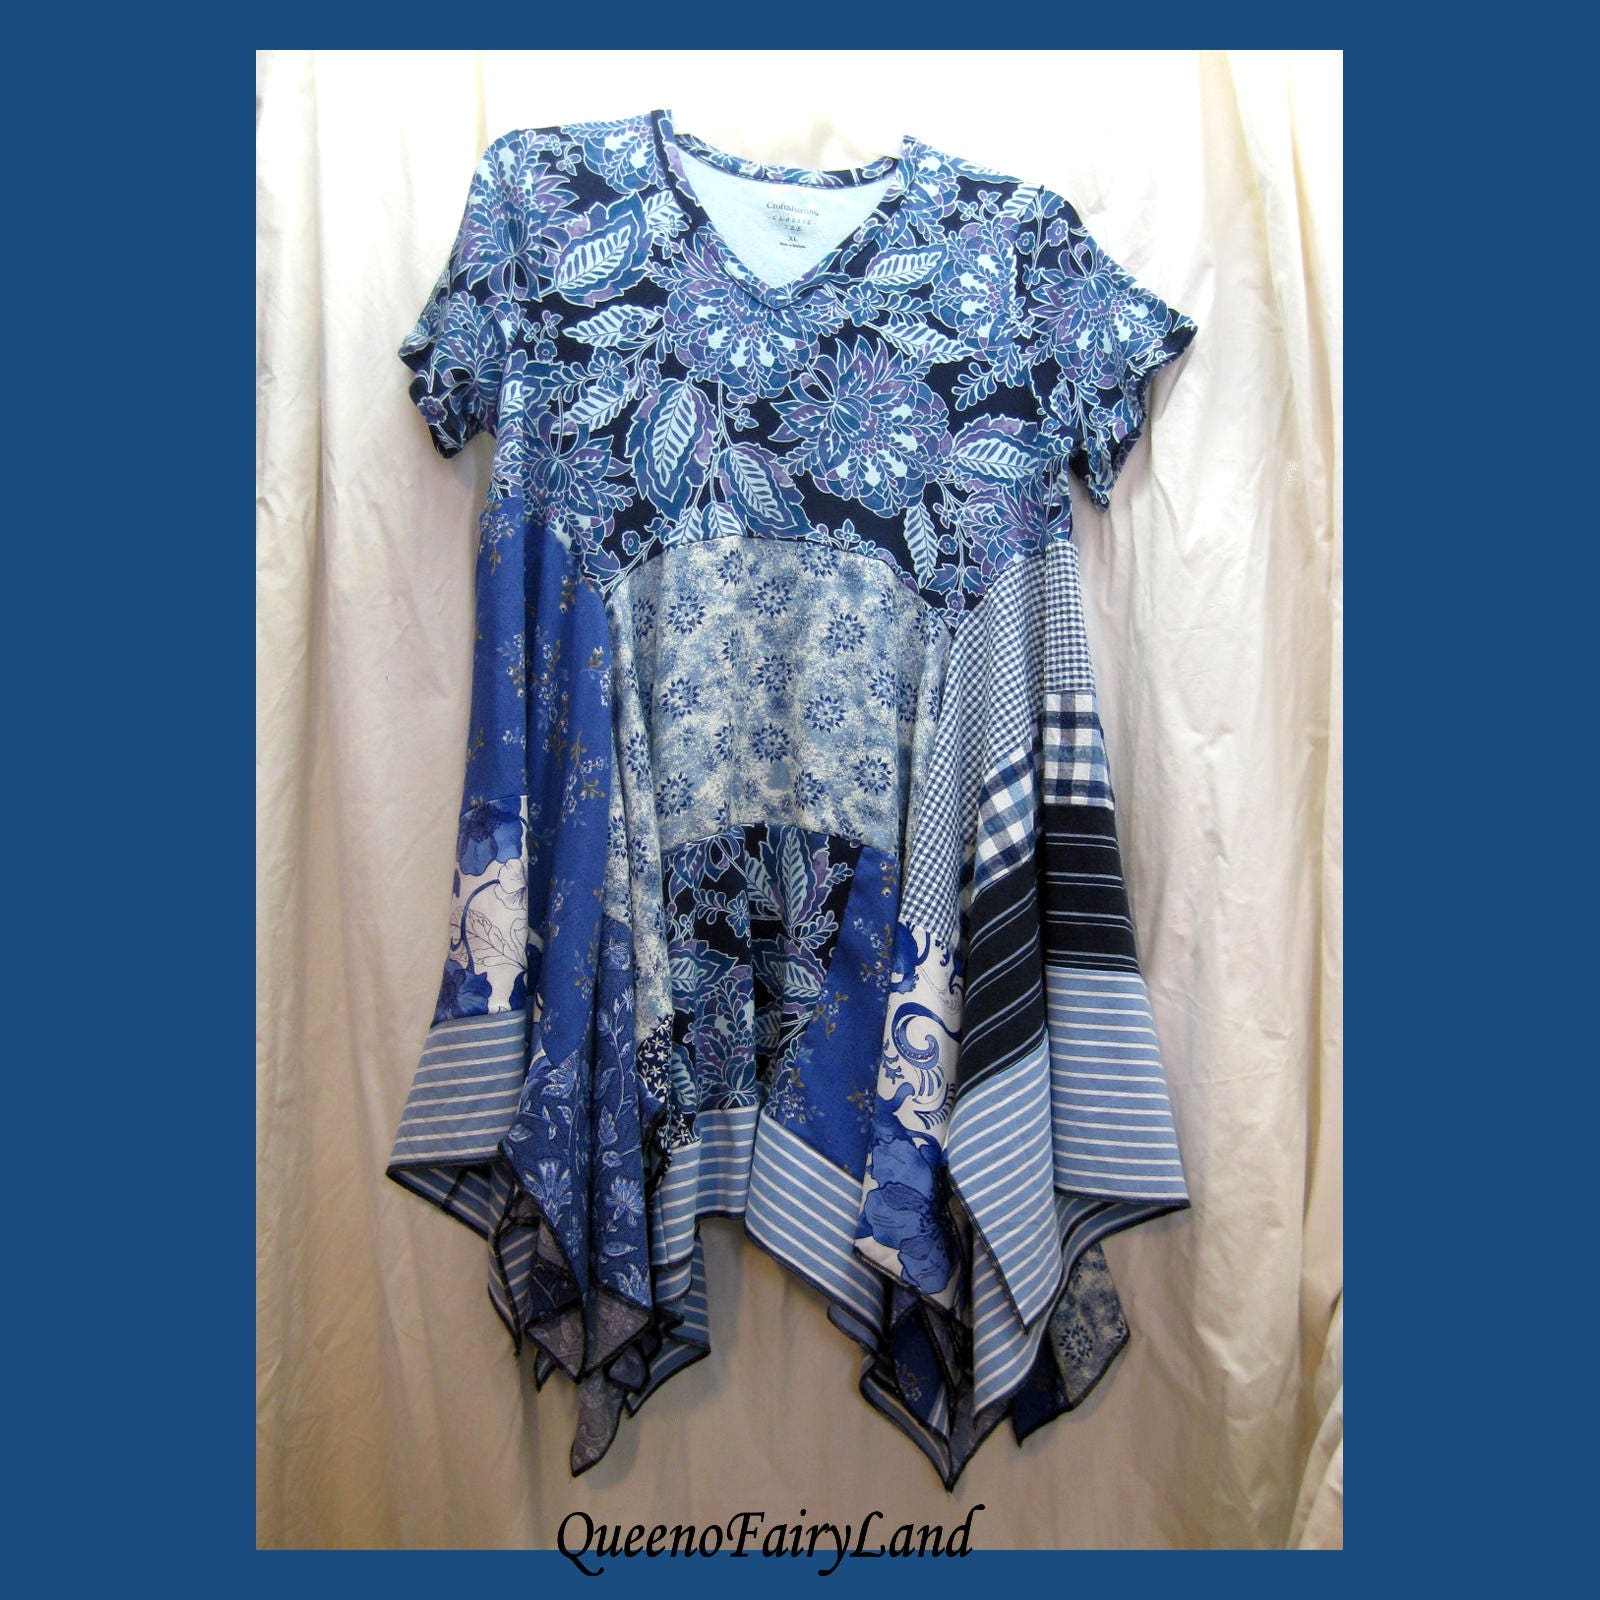 Bohemian Blues Tunic Dress Bust 42 Size XL Re purposed Cotton